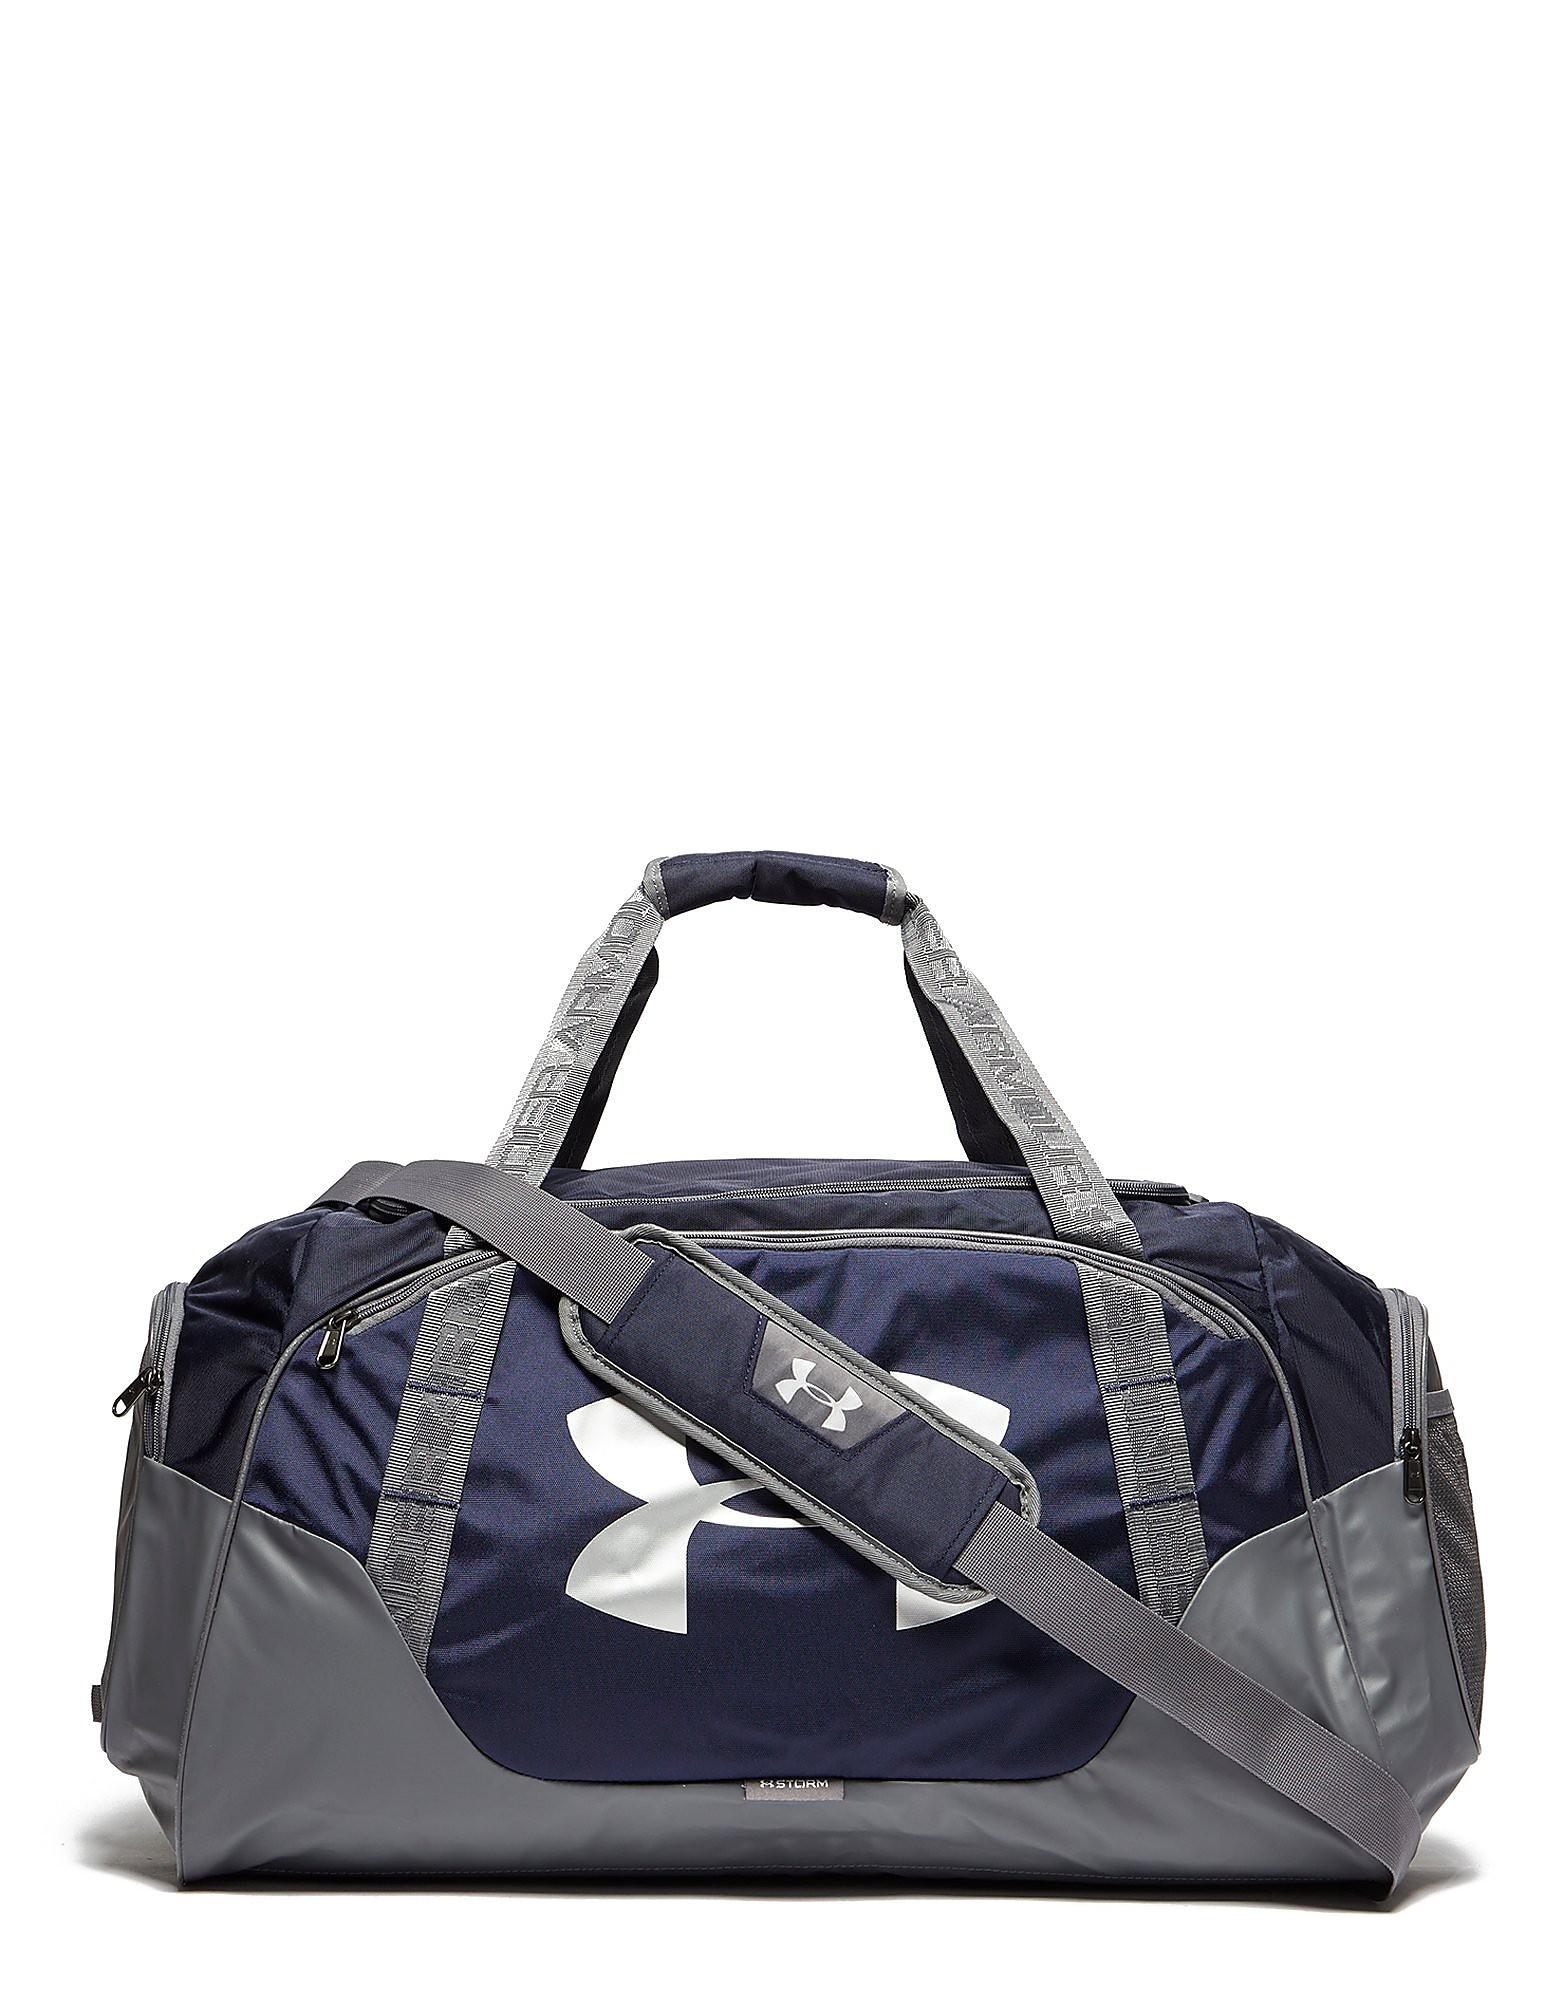 Under Armour Undeniable Large Duffle Bag Marineblau-Grau